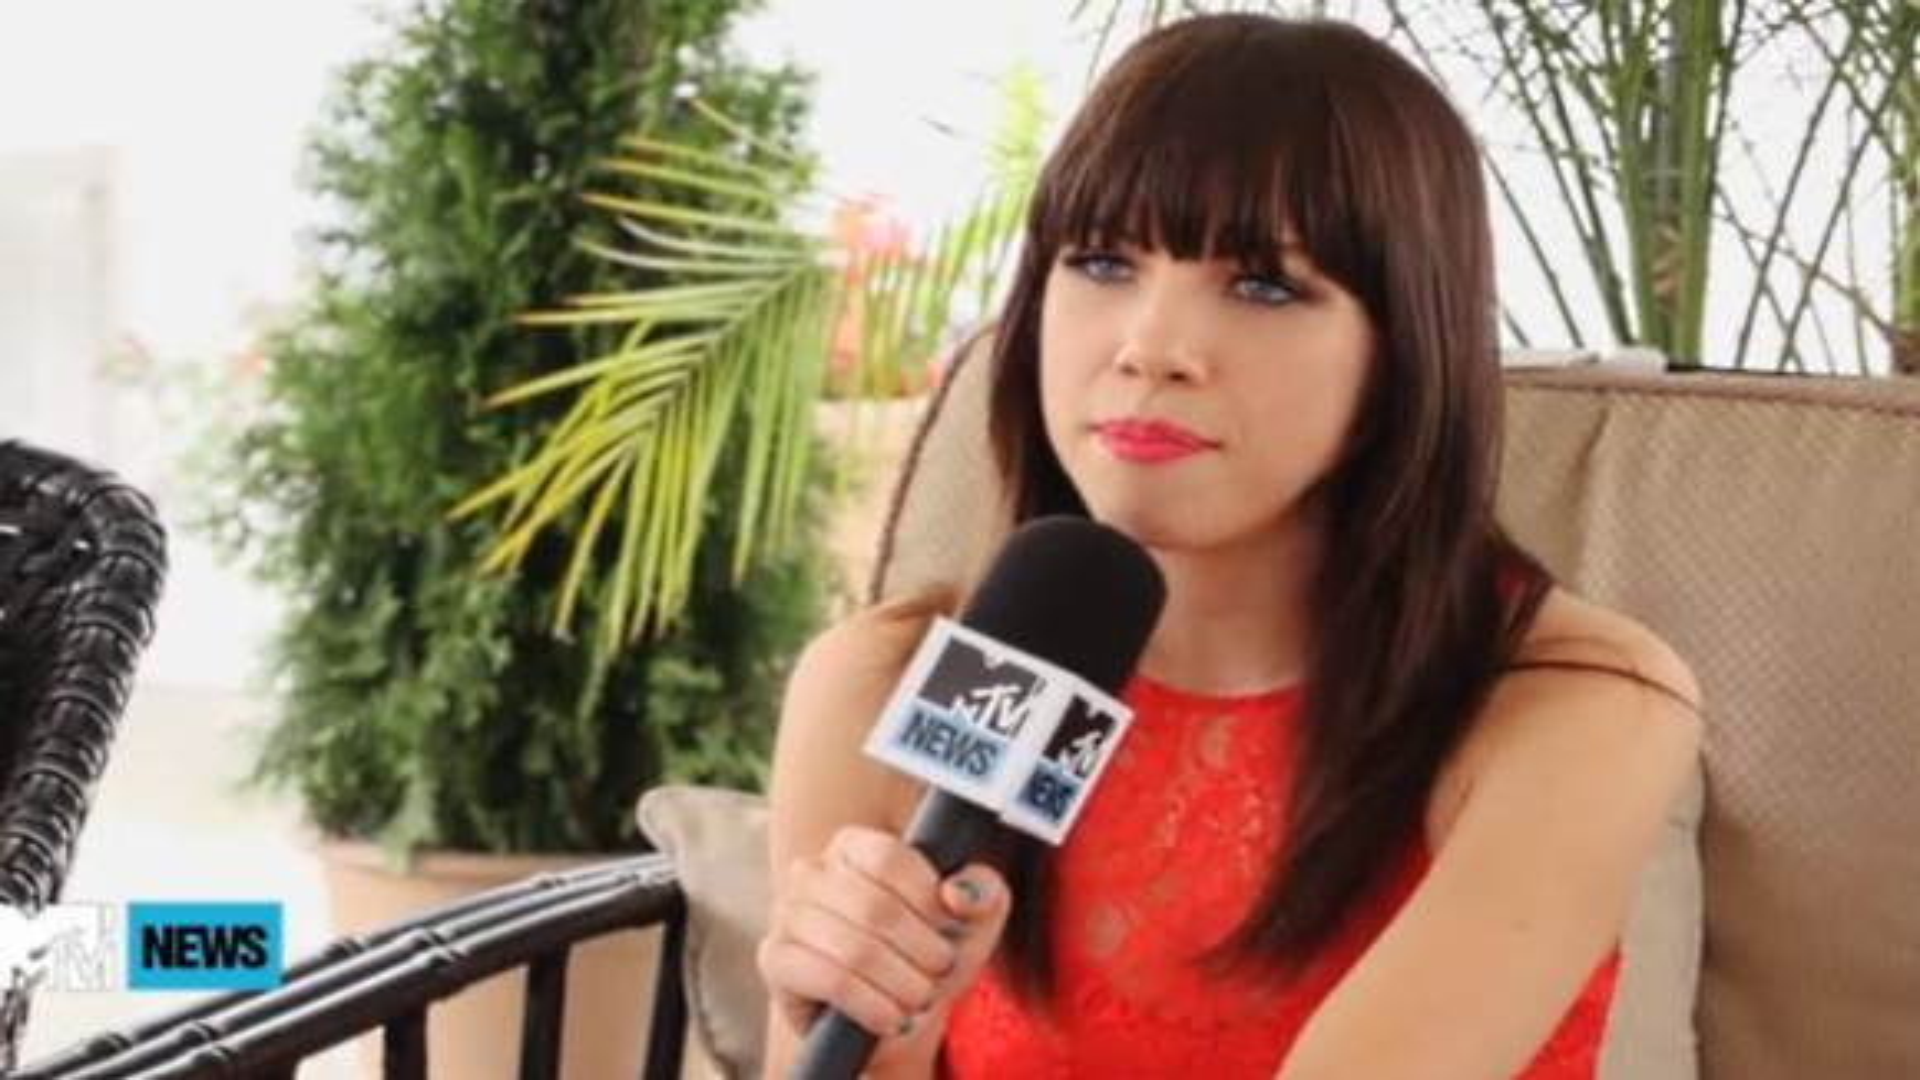 Carly-Rae-Jepsen-MTV-Interview-Justin-Bieber-Tour